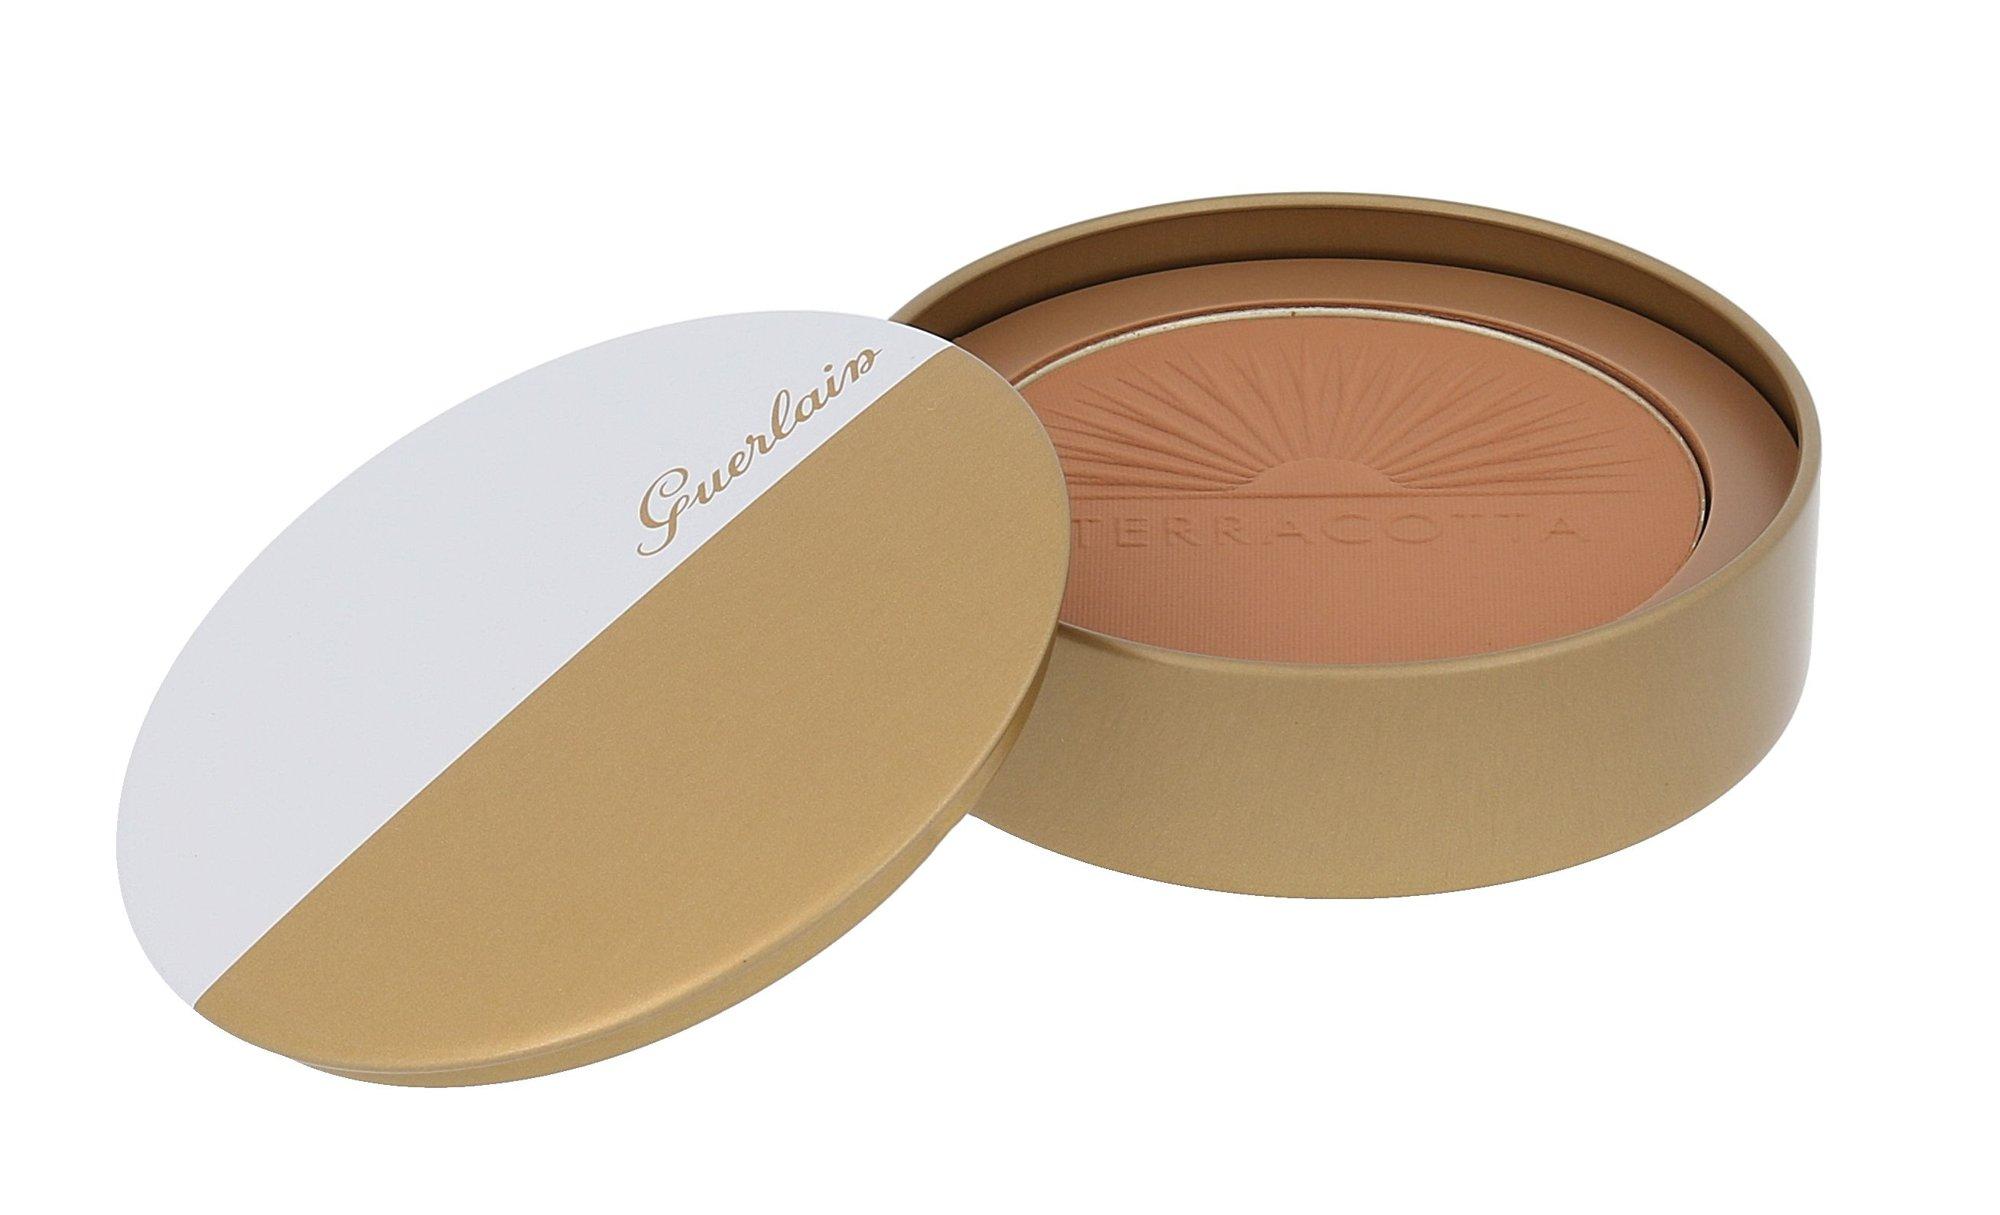 Guerlain Terracotta Powder 10ml